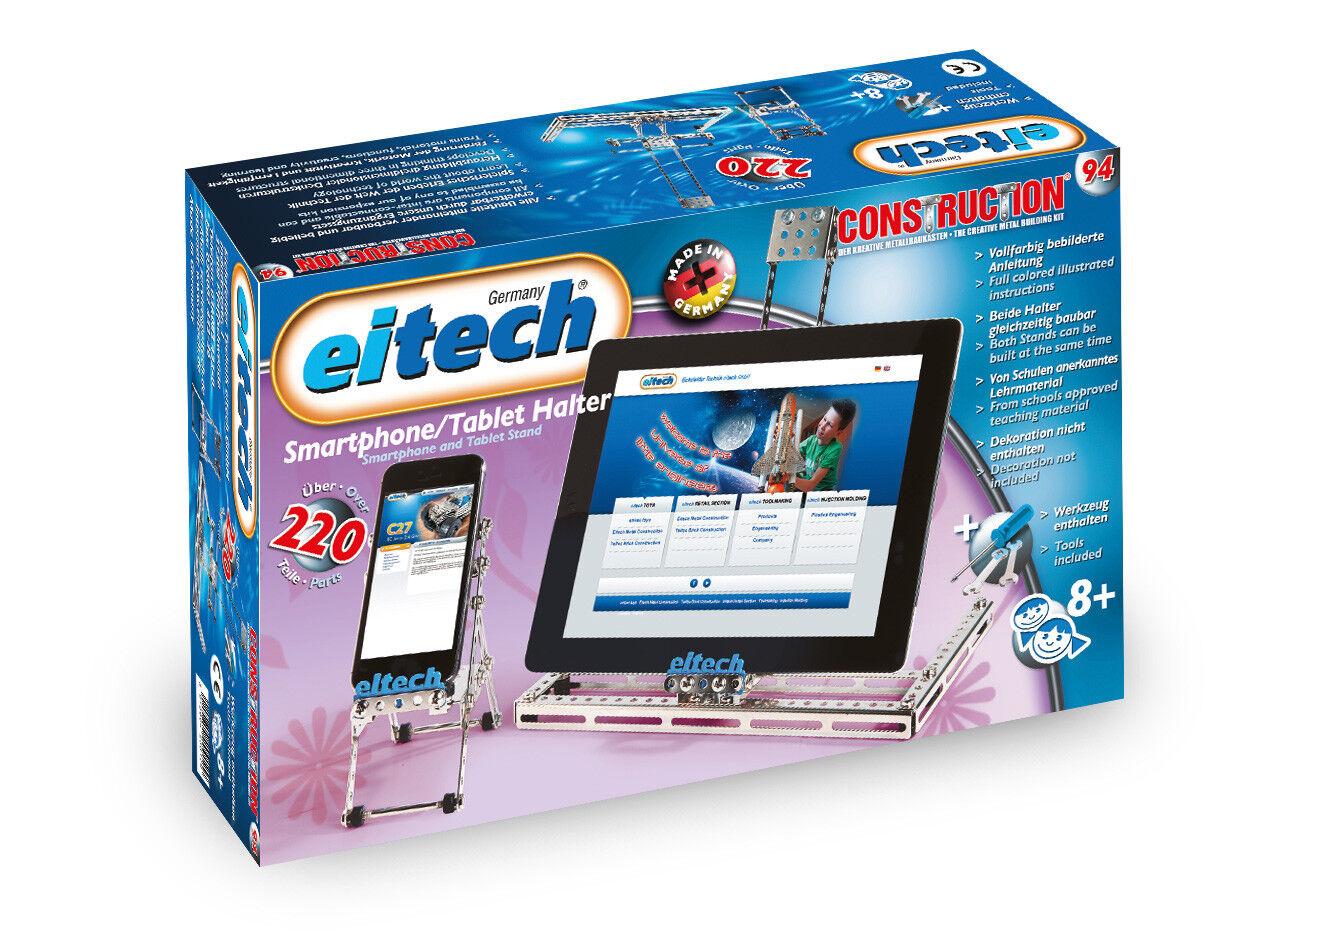 Eitech Smartphone Smartphone Smartphone Tablet Holder 10094-C94 57c69e